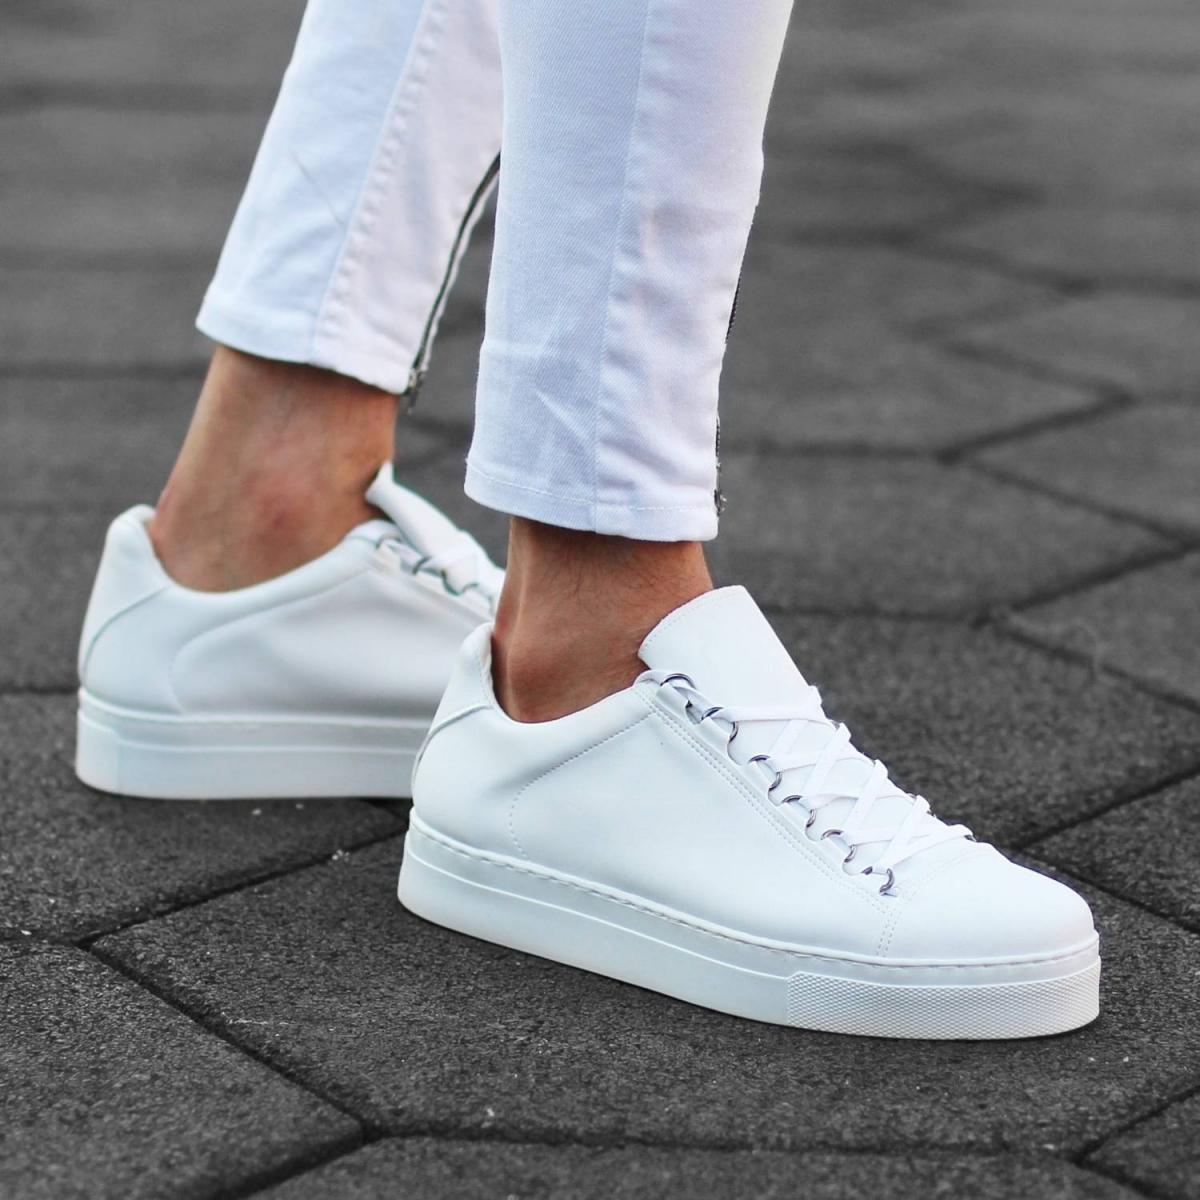 Erkek Mox High Beyaz Sneaker Ayakkabı